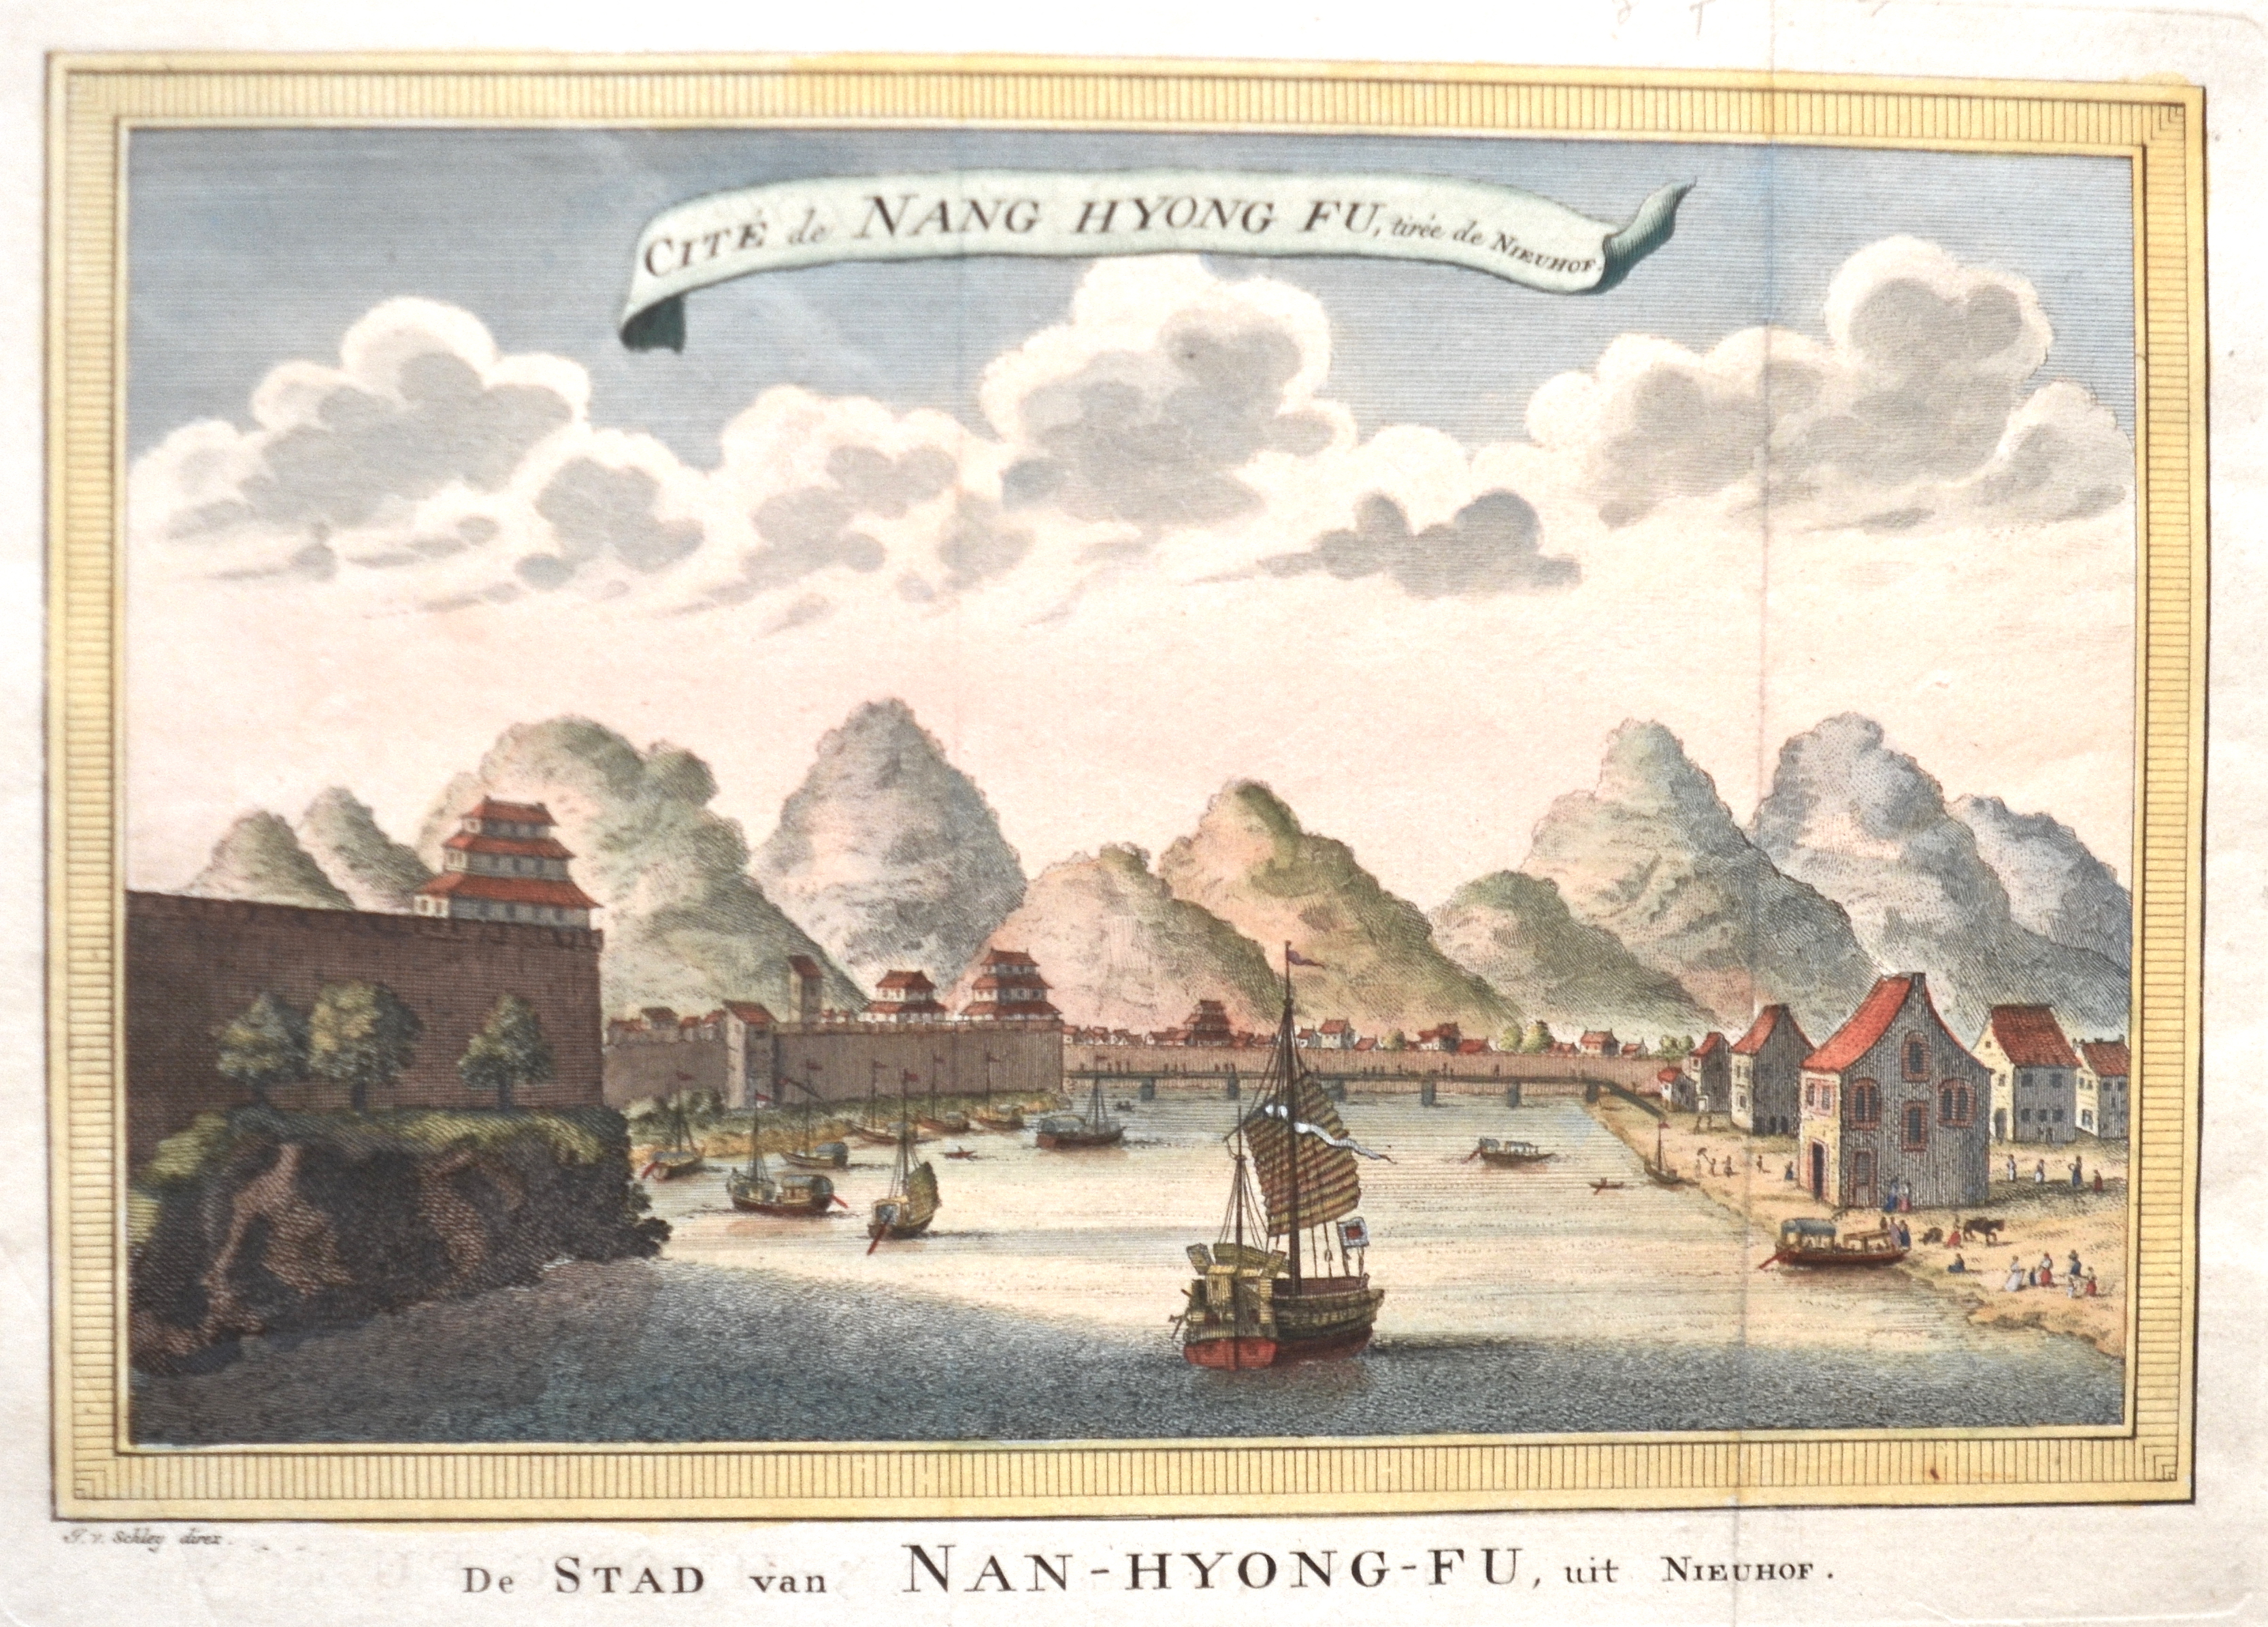 Schley, van der Jacob Cité de Nang Hyong Fu, tirée de Nieuhof.